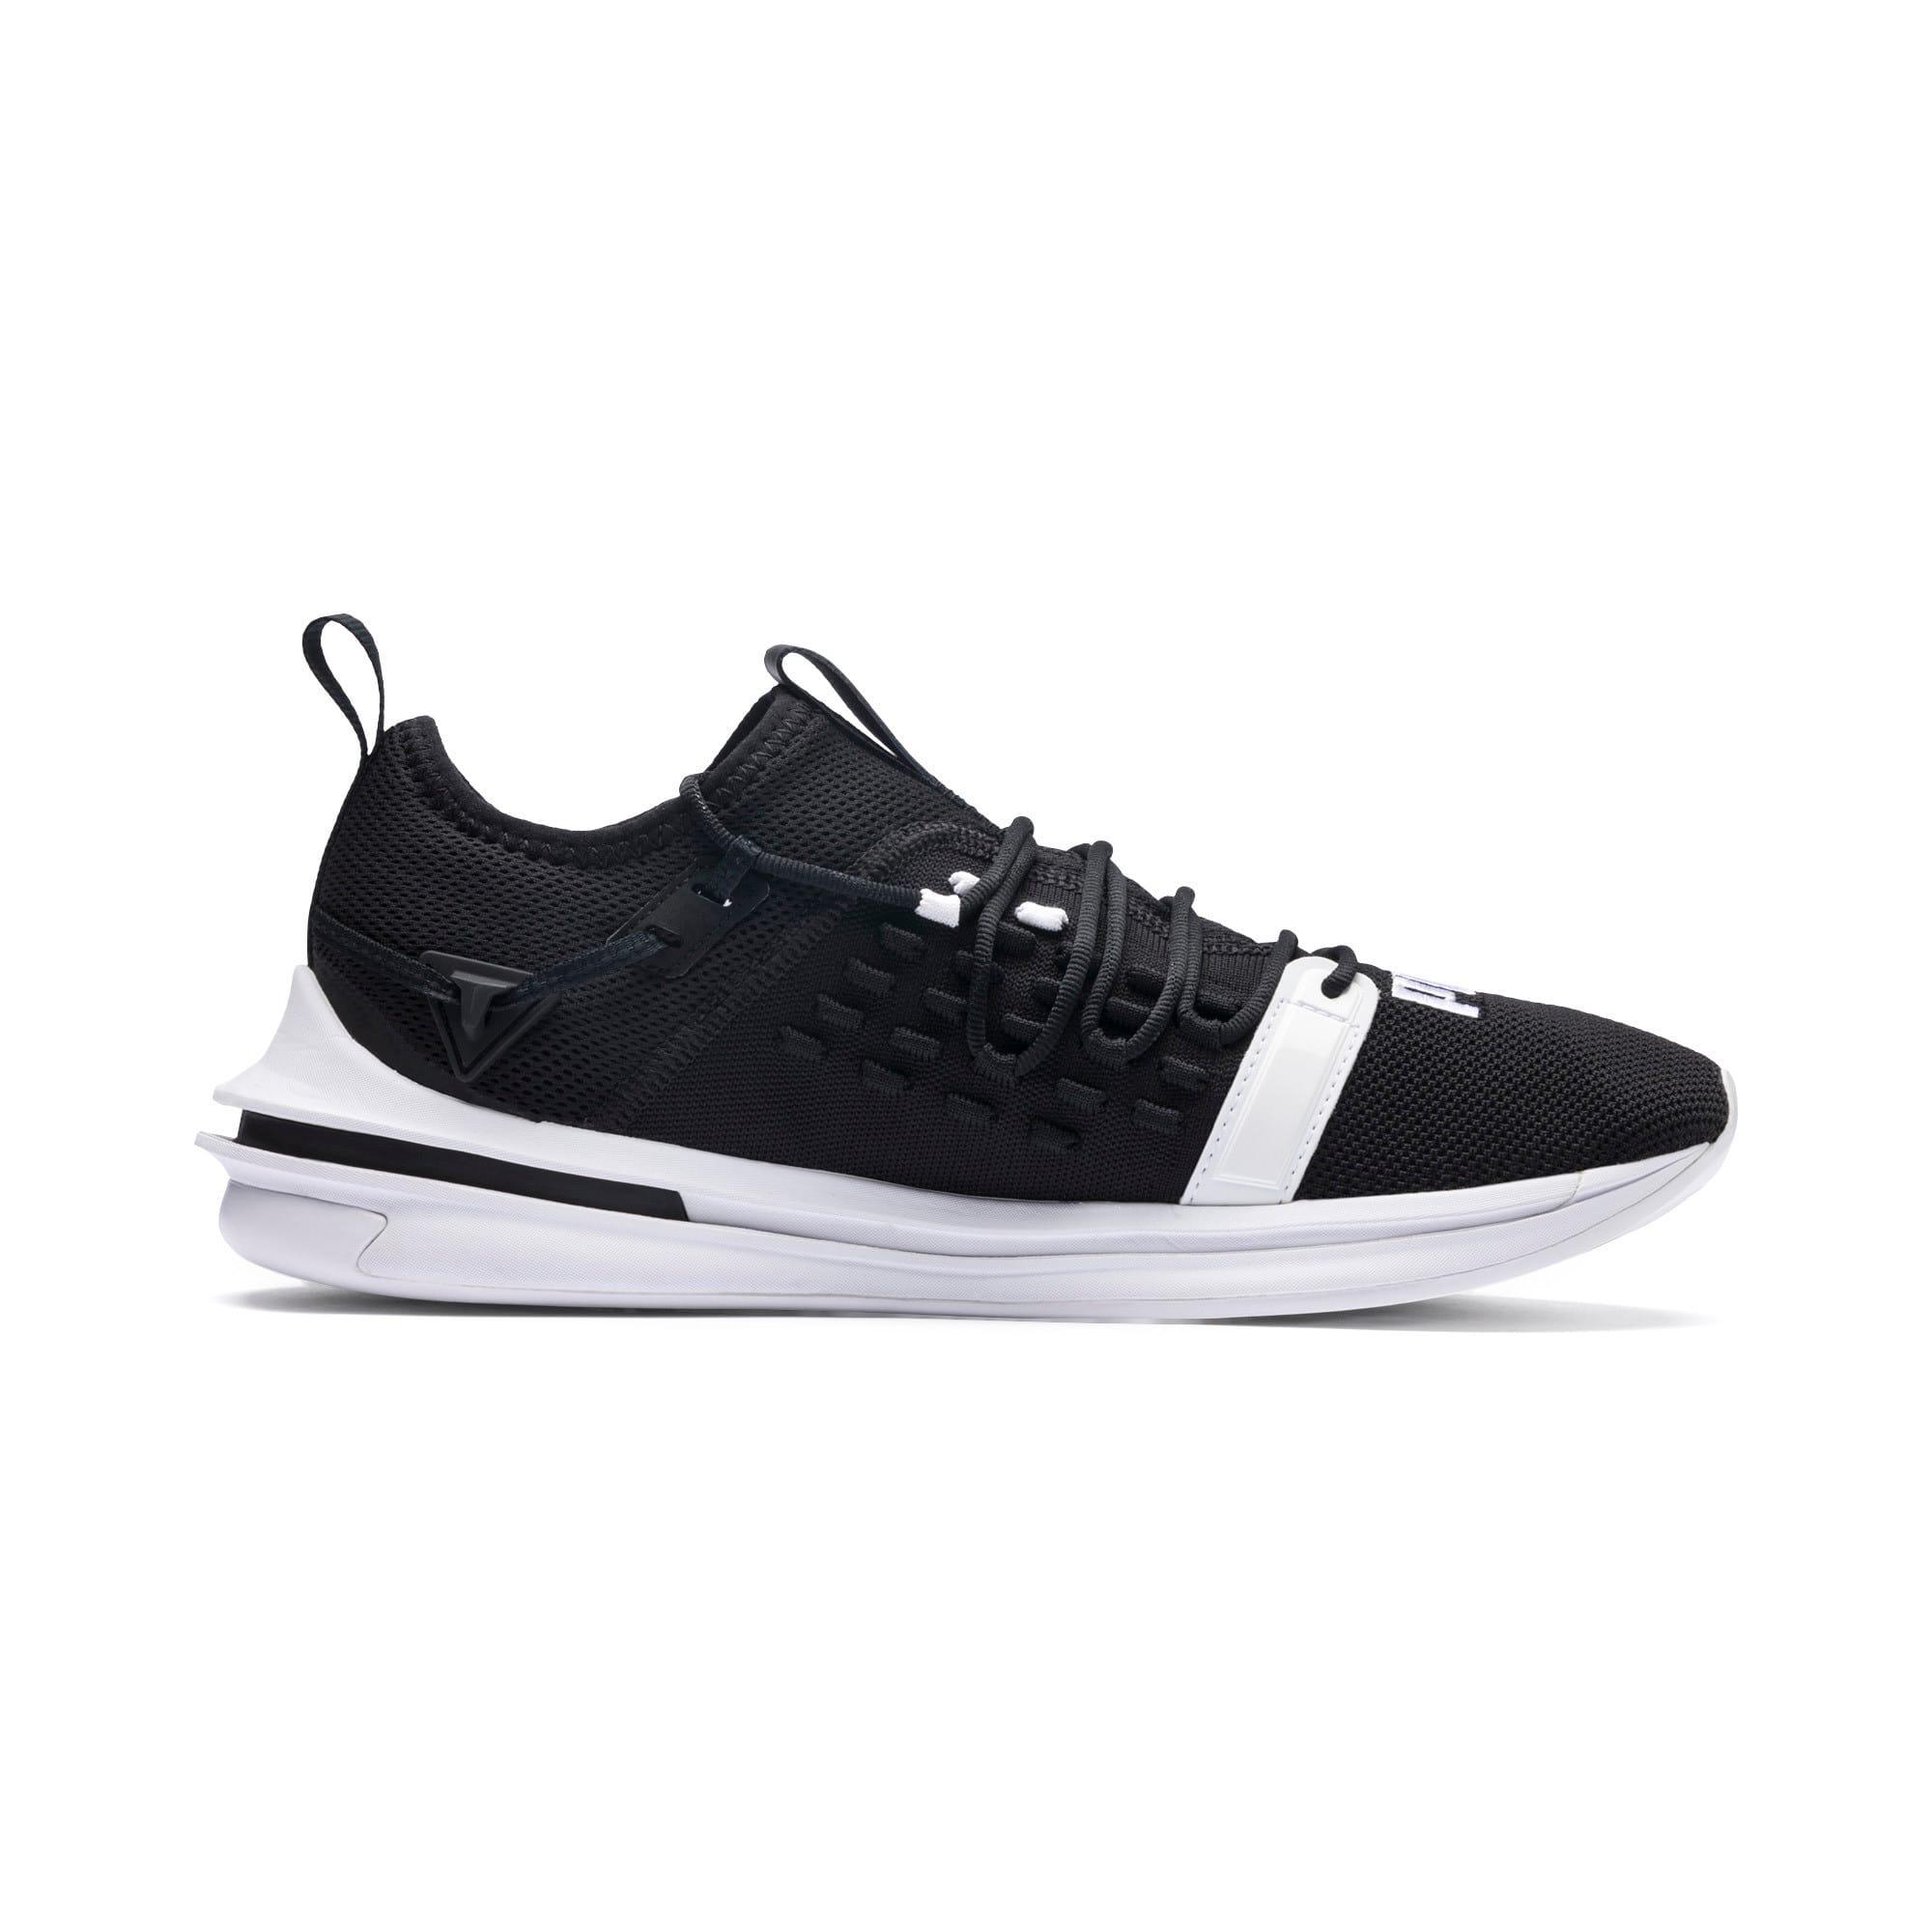 Thumbnail 3 of IGNITE Limitless SR FUSEFIT Running Shoes, Puma Black-Puma White, medium-IND